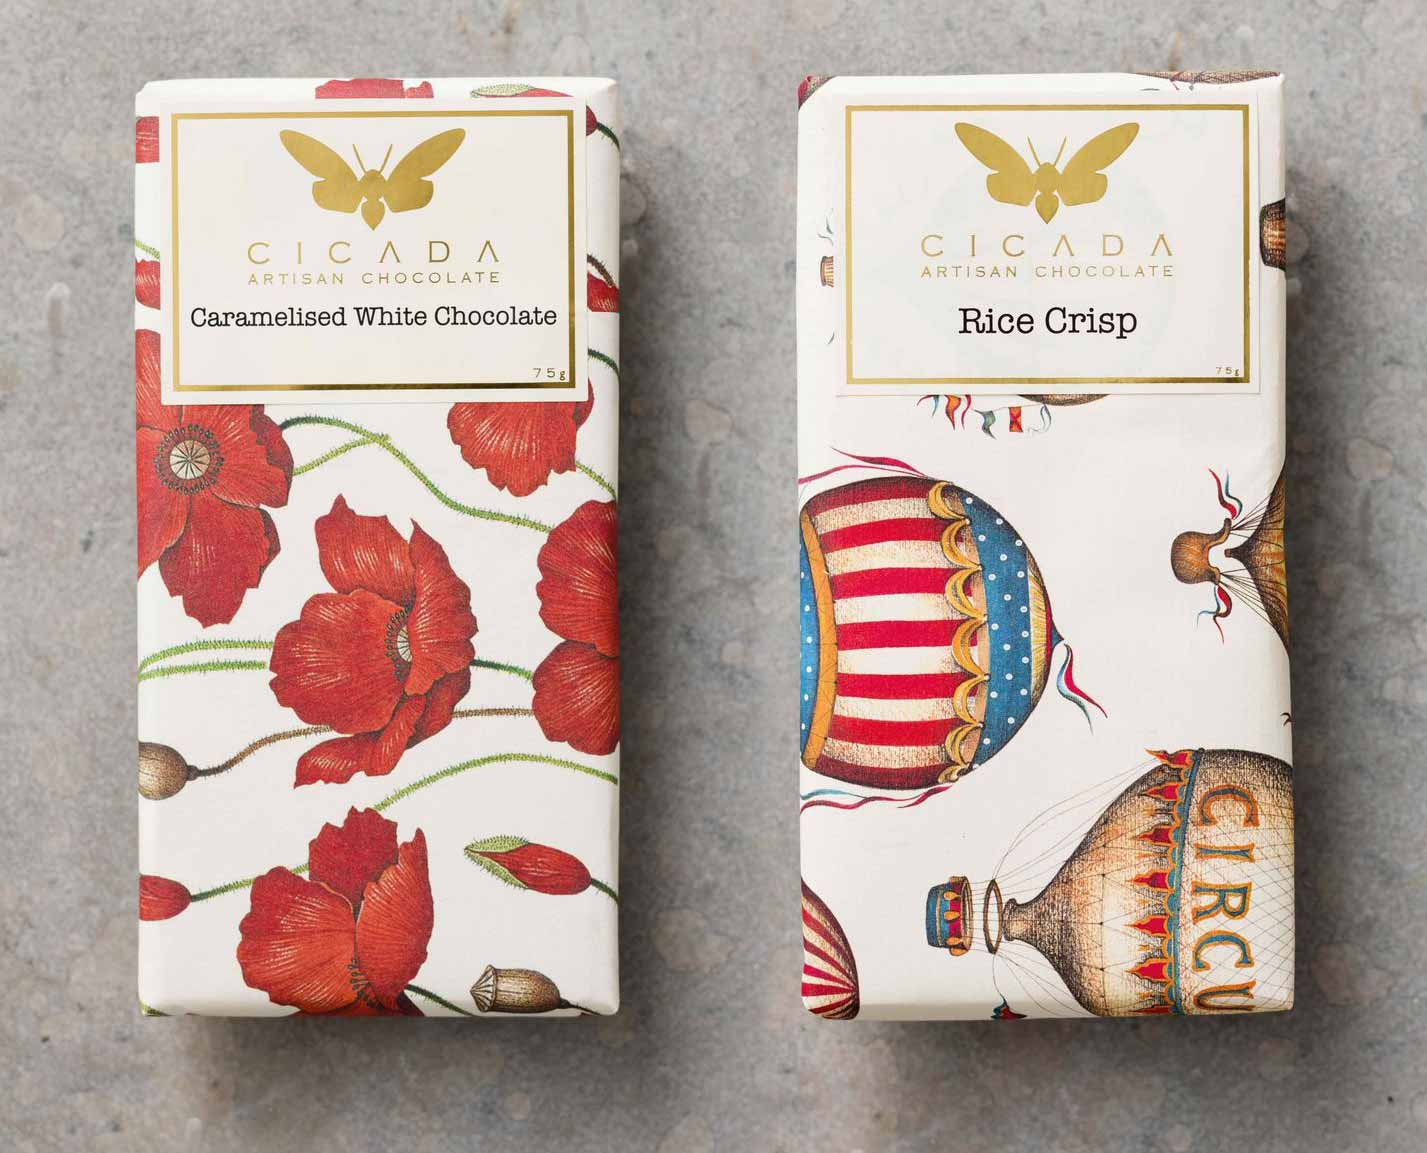 Decorative paper wrapping chocolate bar Cicada Australia